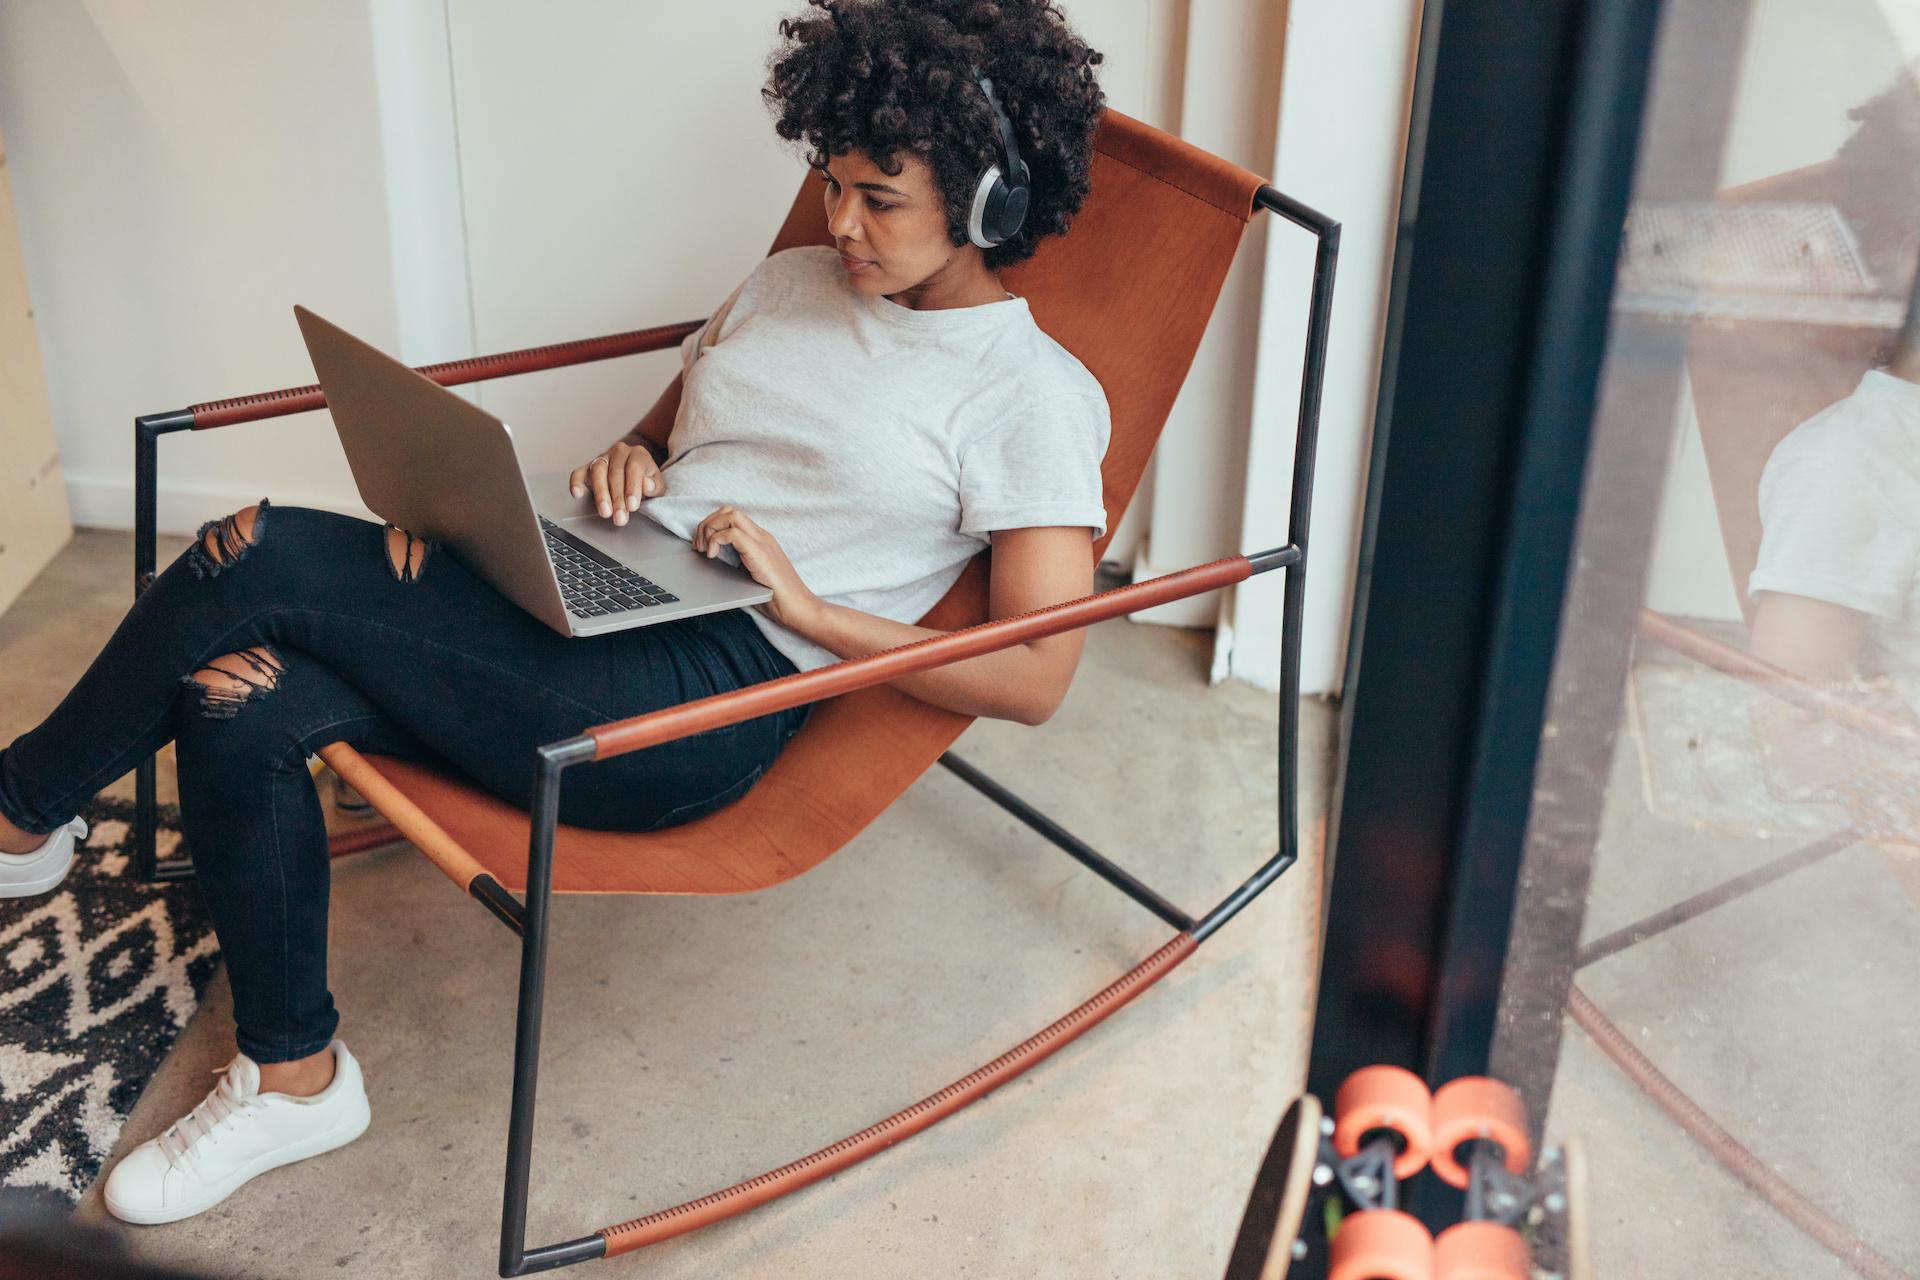 Photo: Jacob Lund, Adobe Stock